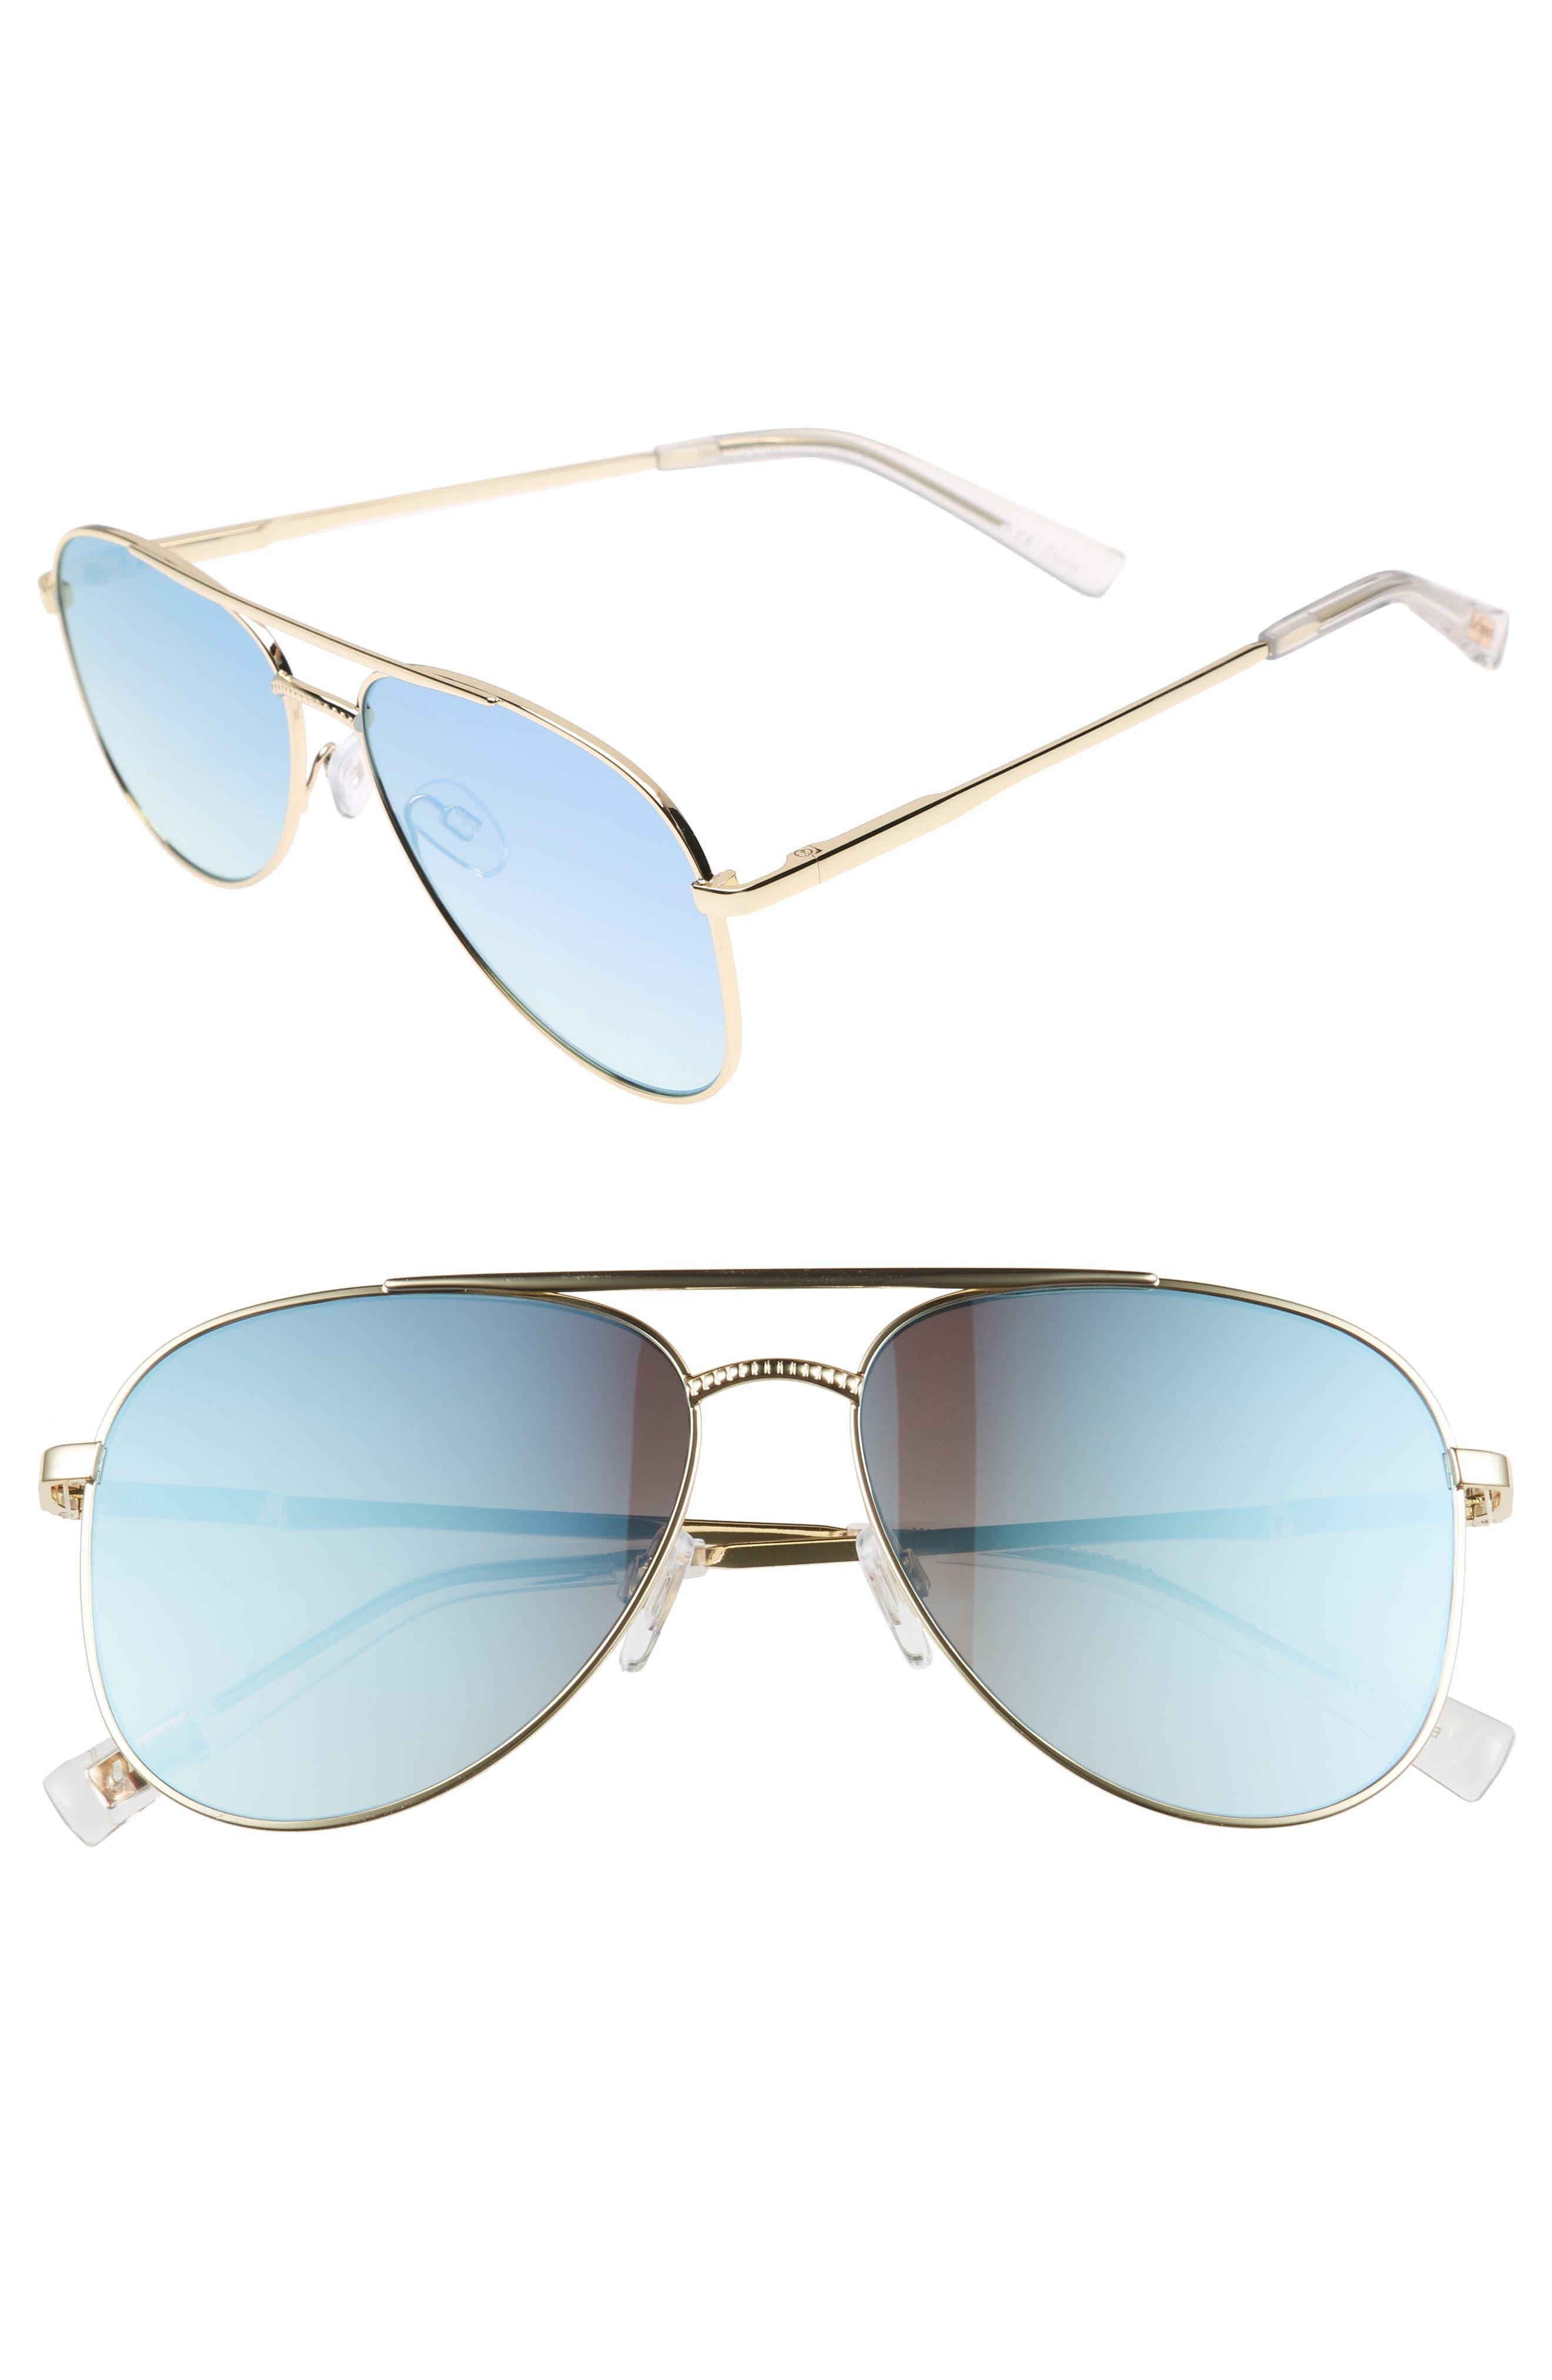 Kingdom 57mm Aviator Sunglasses,                         Main,                         color, Bright Gold